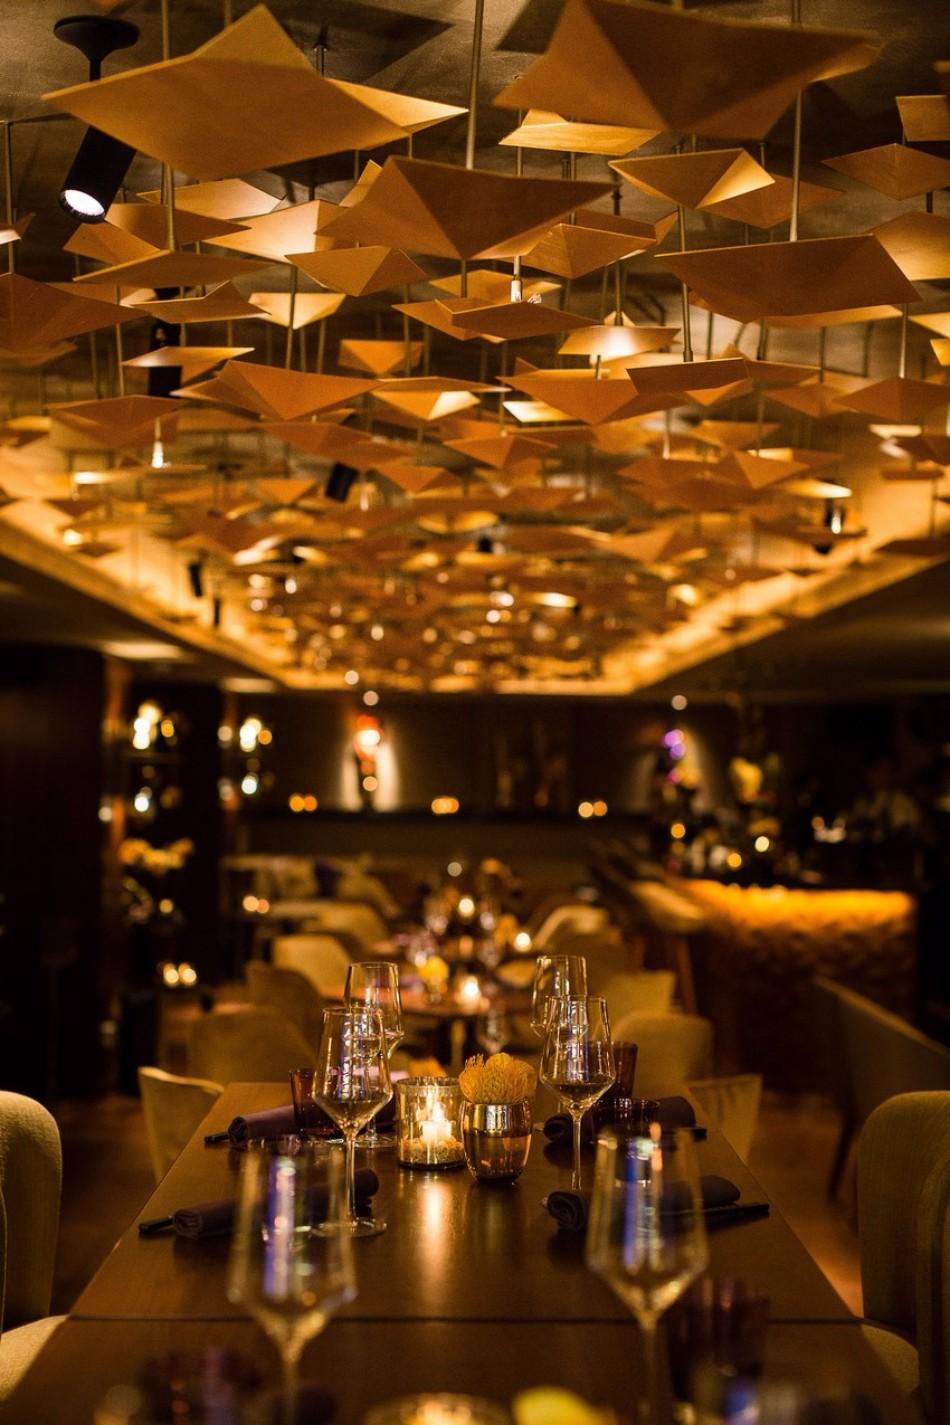 The Stunning Interior Design of the Luxury Restaurant Nikkei Nine | www.bocadolobo.com #interiordesign #homedecorideas #decorations #homedecor #luxurybrands #luxuryrestaurants #exclusivedesign #restaurants #luxury @homedecorideas luxury restaurant The Stunning Interior Design of the Luxury Restaurant Nikkei Nine The Stunning Interior Design of the Luxury Restaurant Nikkei Nine 7